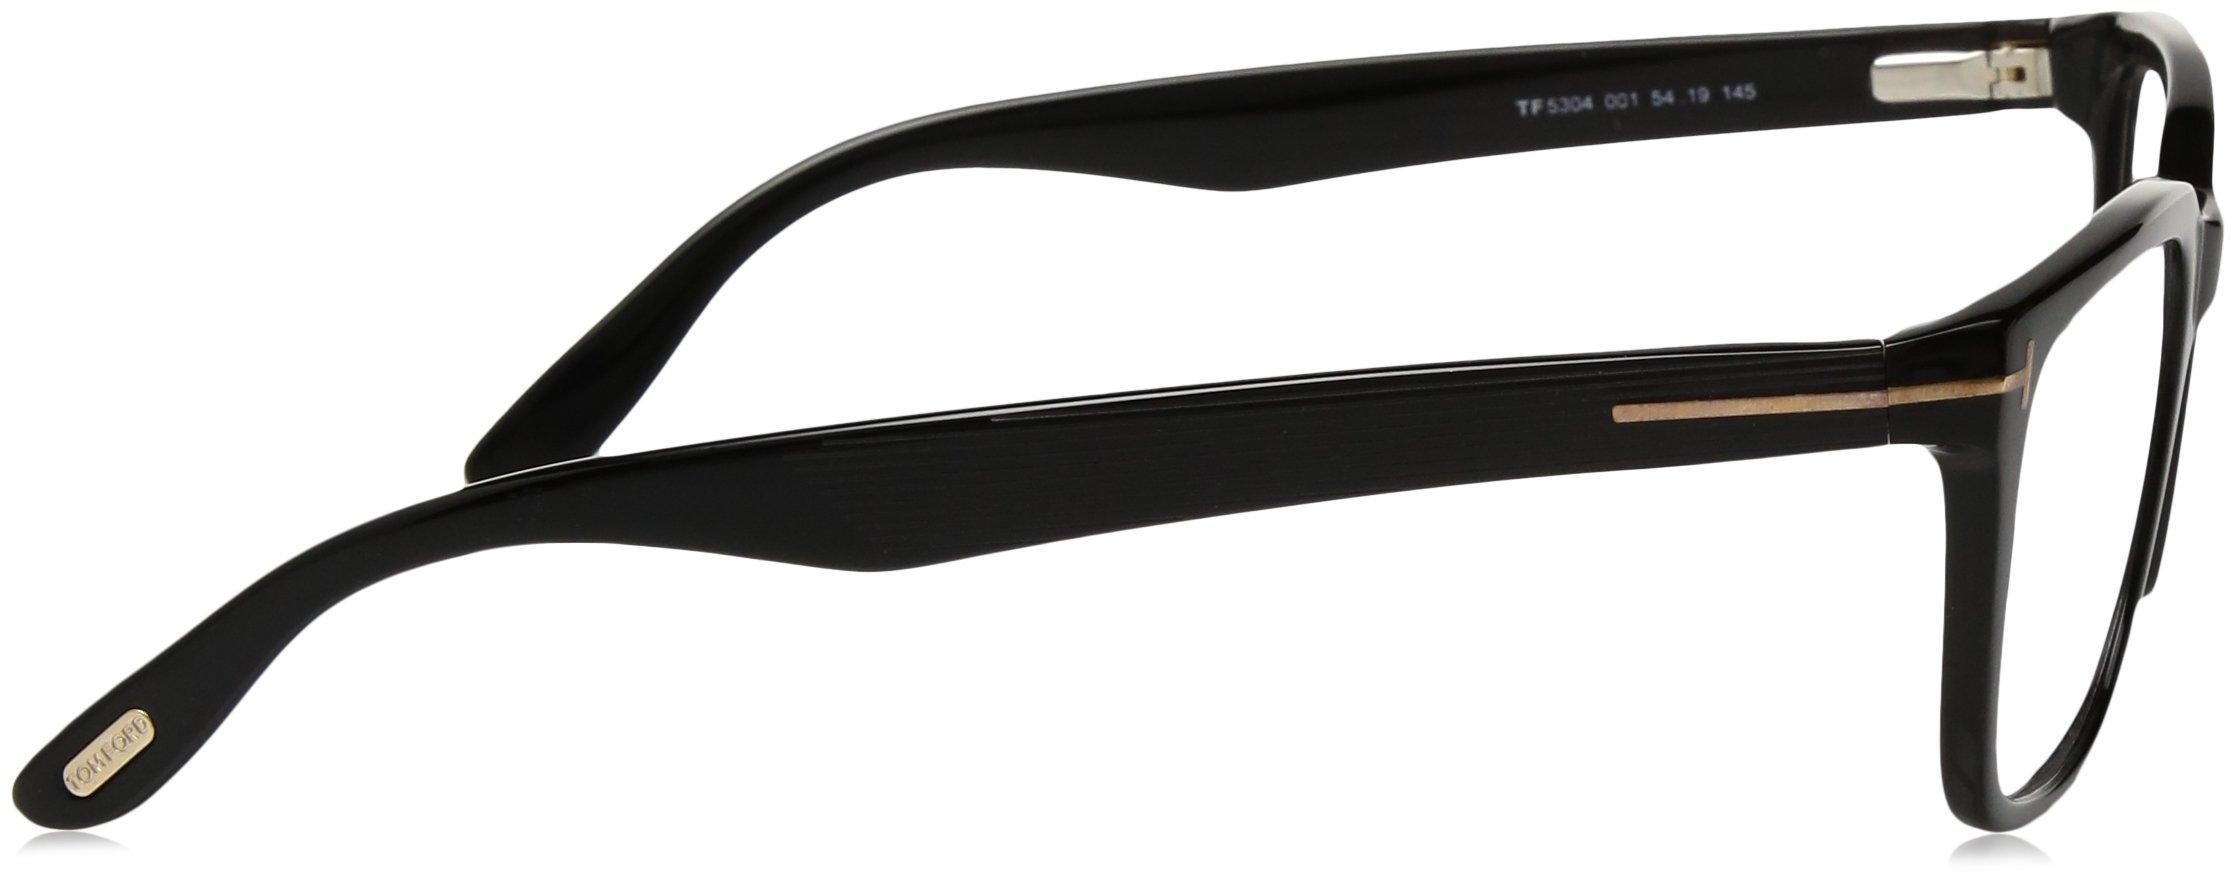 TOM Ford Eyeglasses Tf 5304 001 Shiny Black Tf5304-001-54mm by Tom Ford (Image #3)